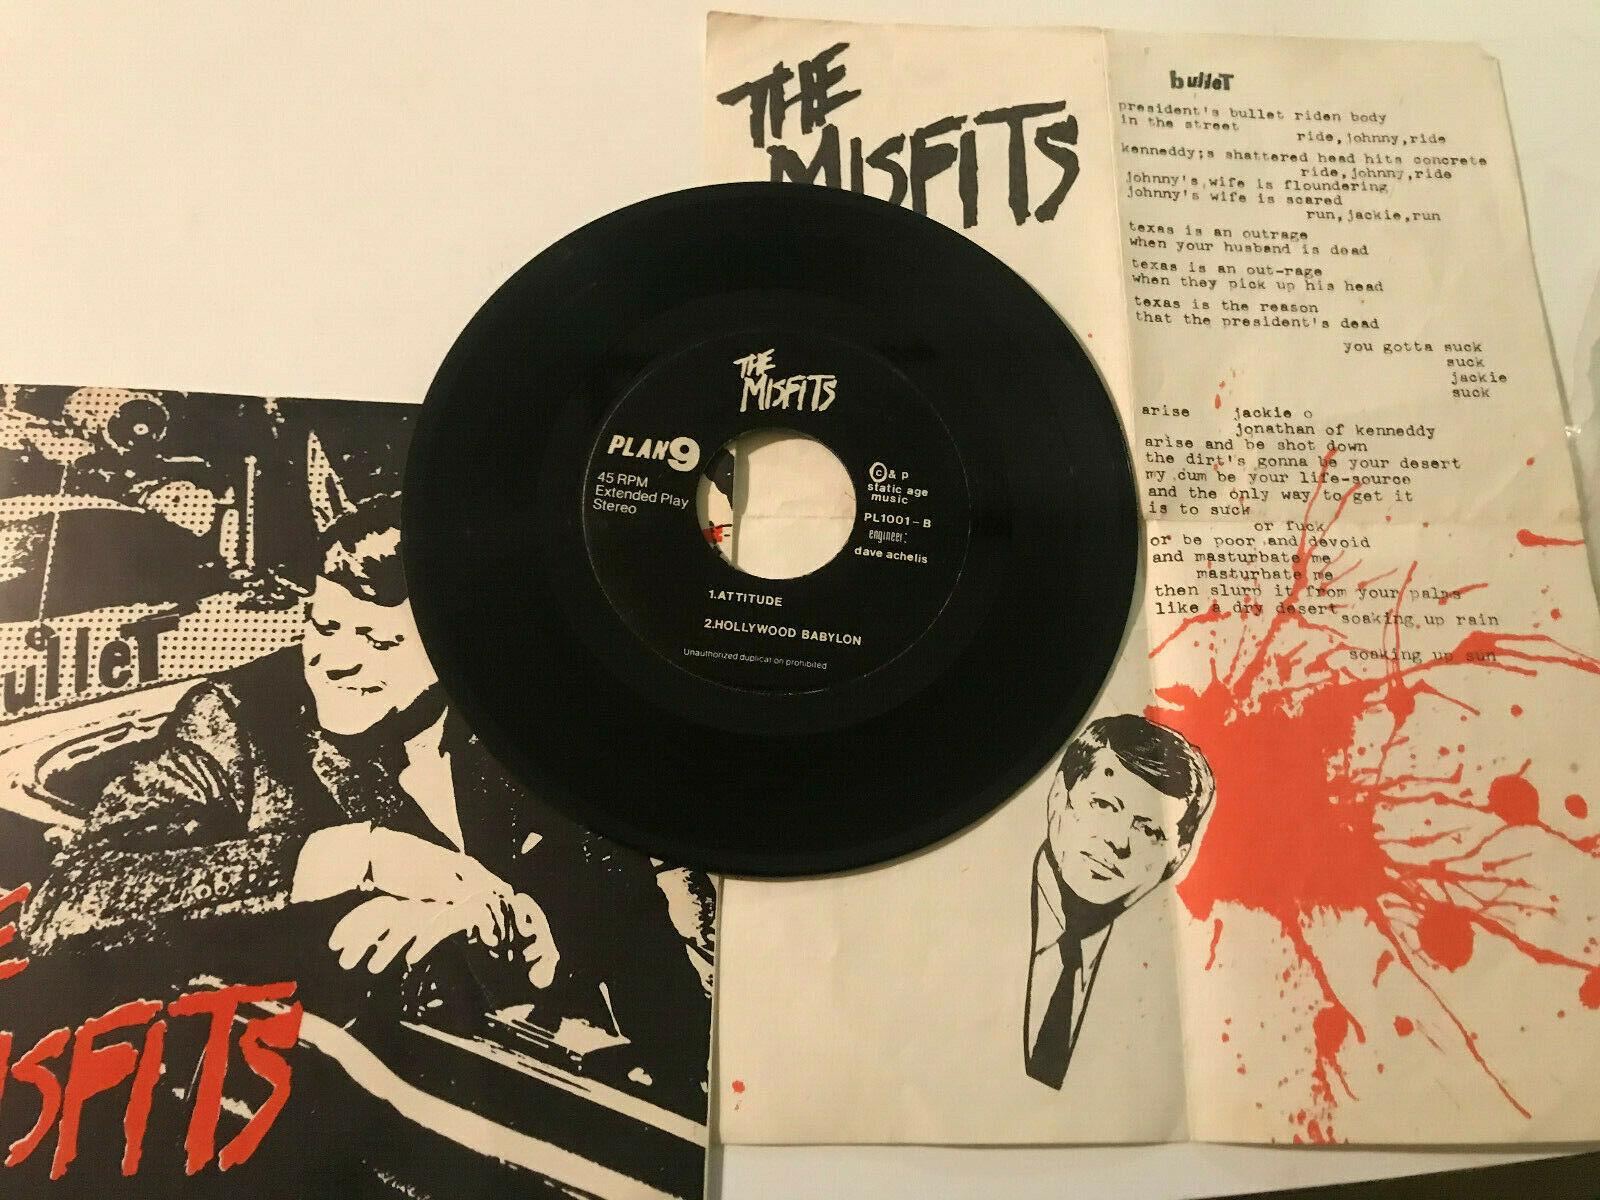 Punk EP Plan 9   Misfits   Bullet   Attitude Hollywood   Babylon  We are 138 45